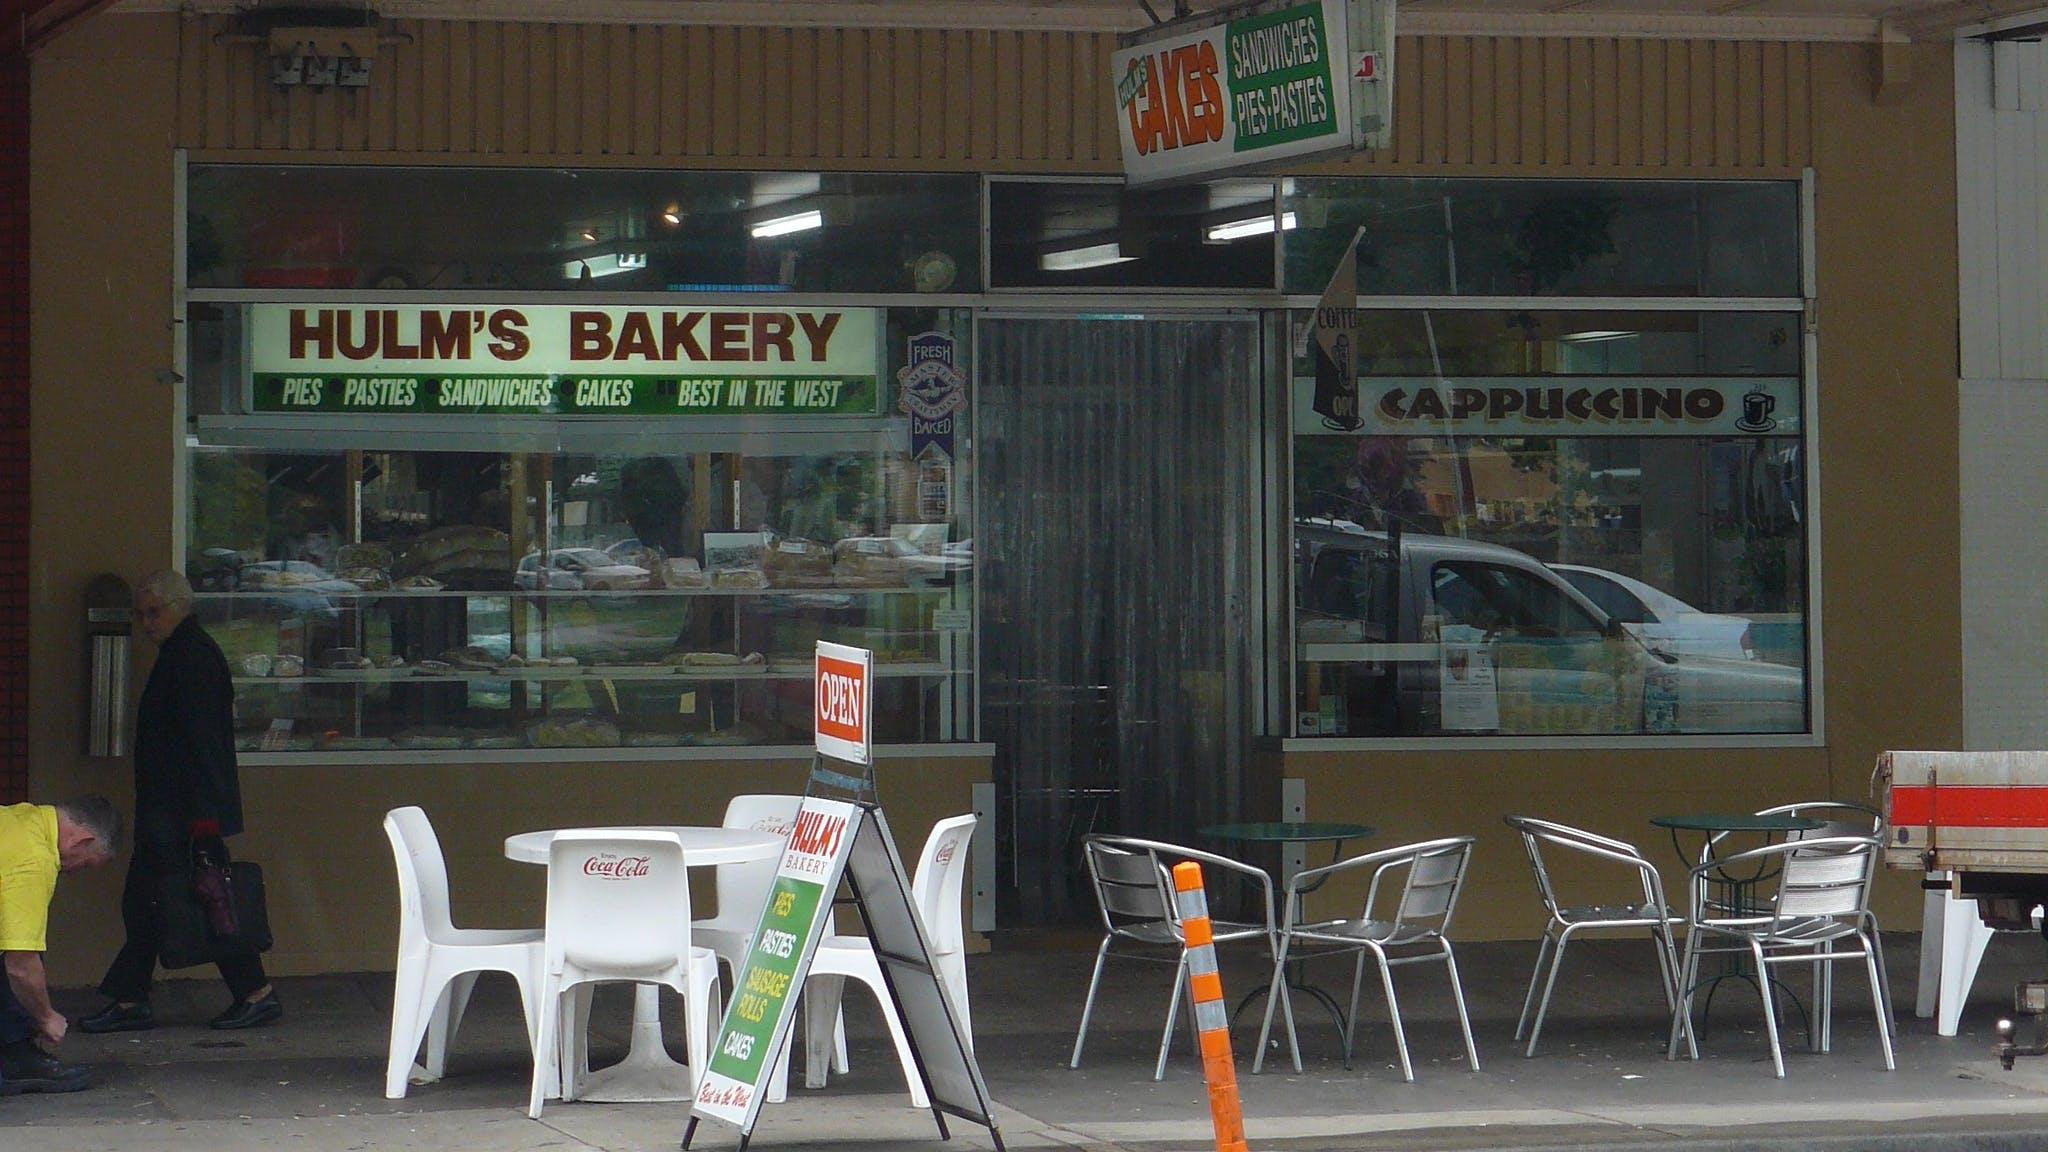 Hulm's Bakery Colac